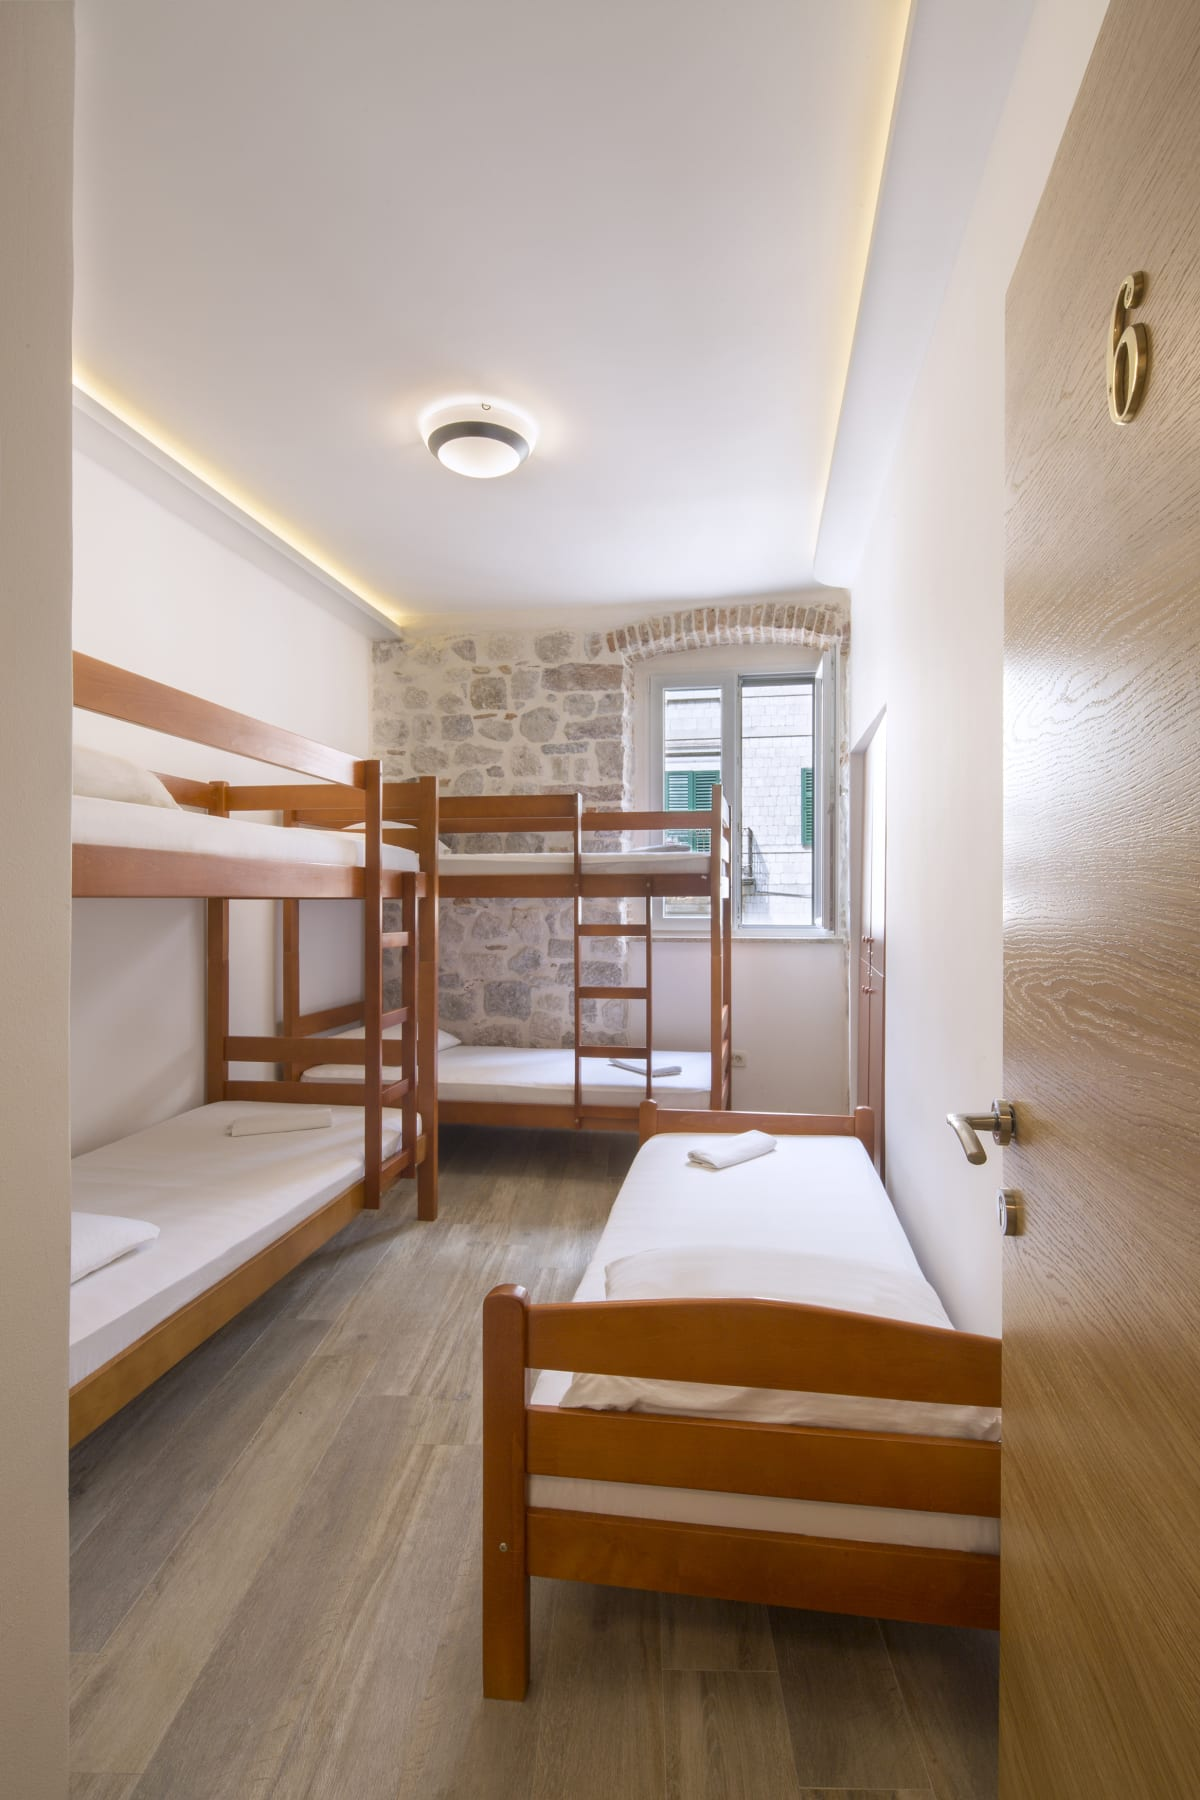 Hostel Centrum, Kotor, Montenegro hostel